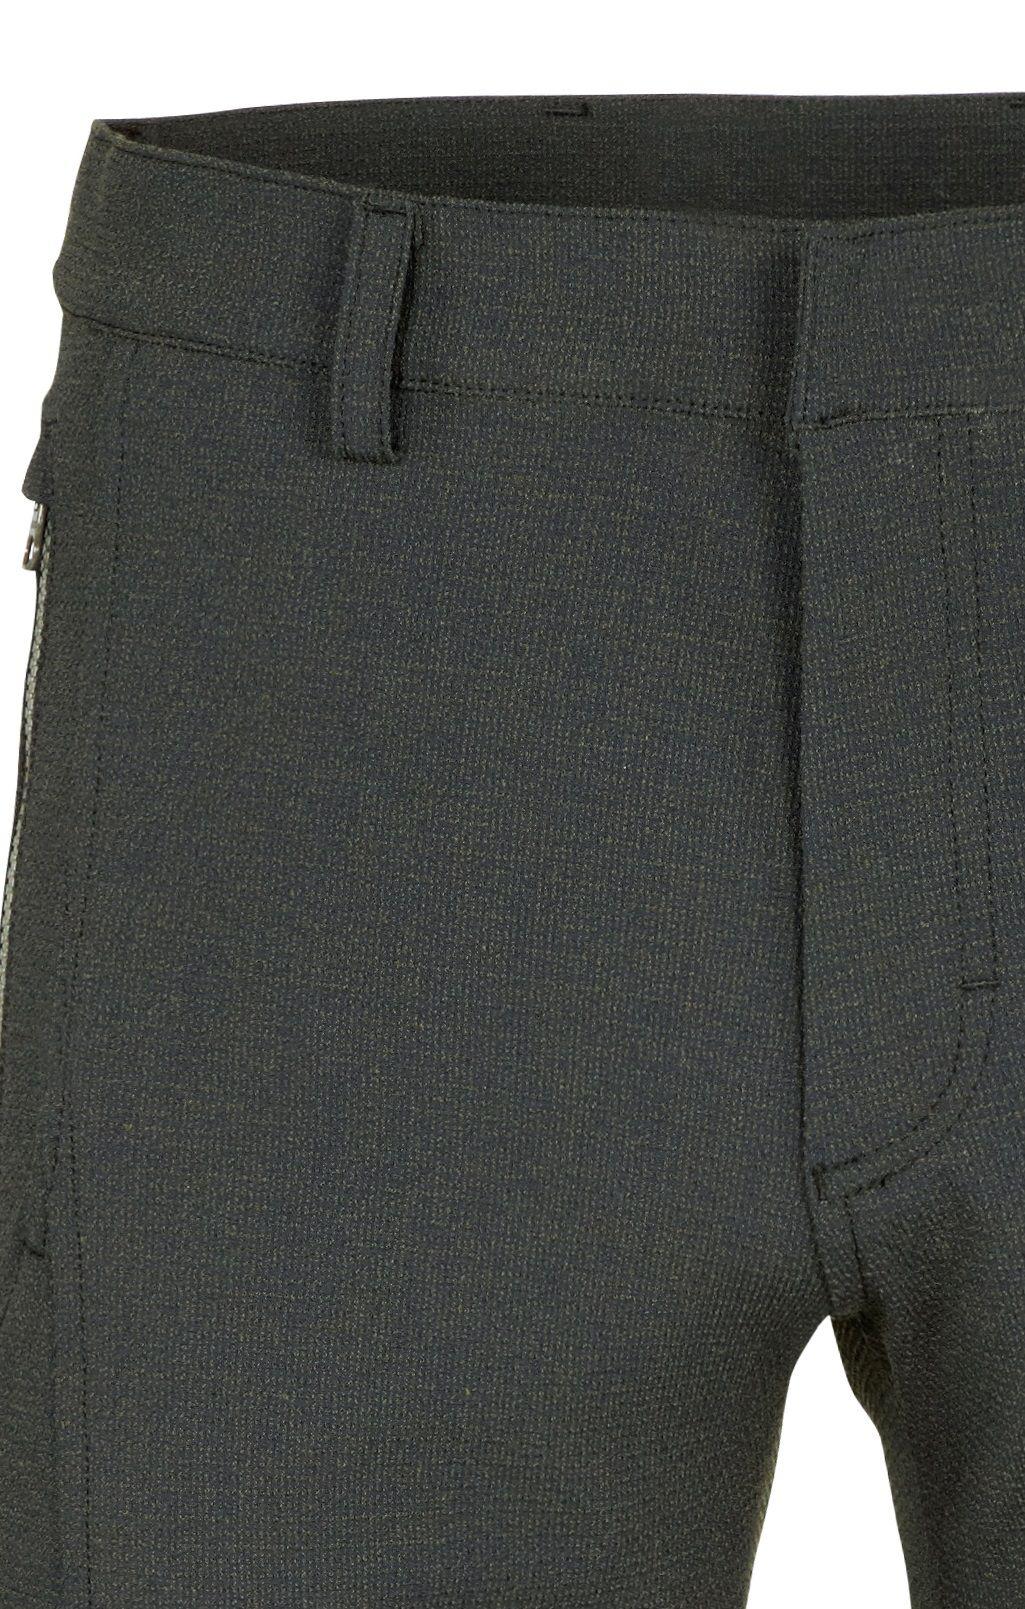 Pantalon de traque résistant Yukon X-Jagd